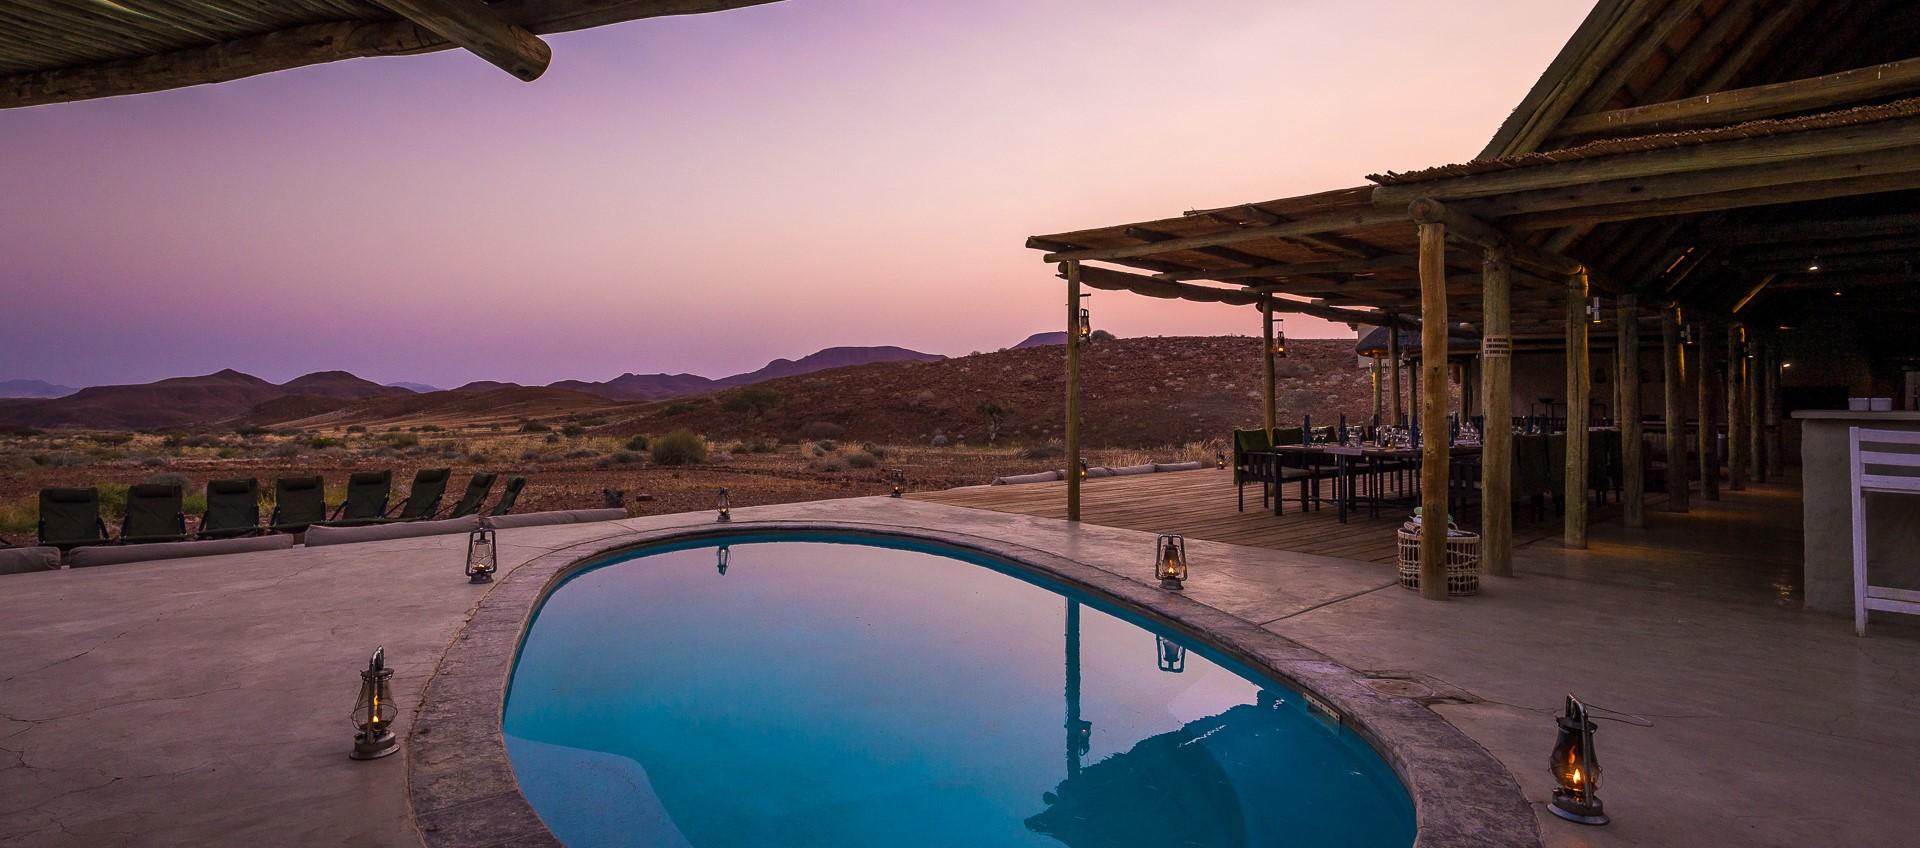 damaraland_camp_swimming_pool